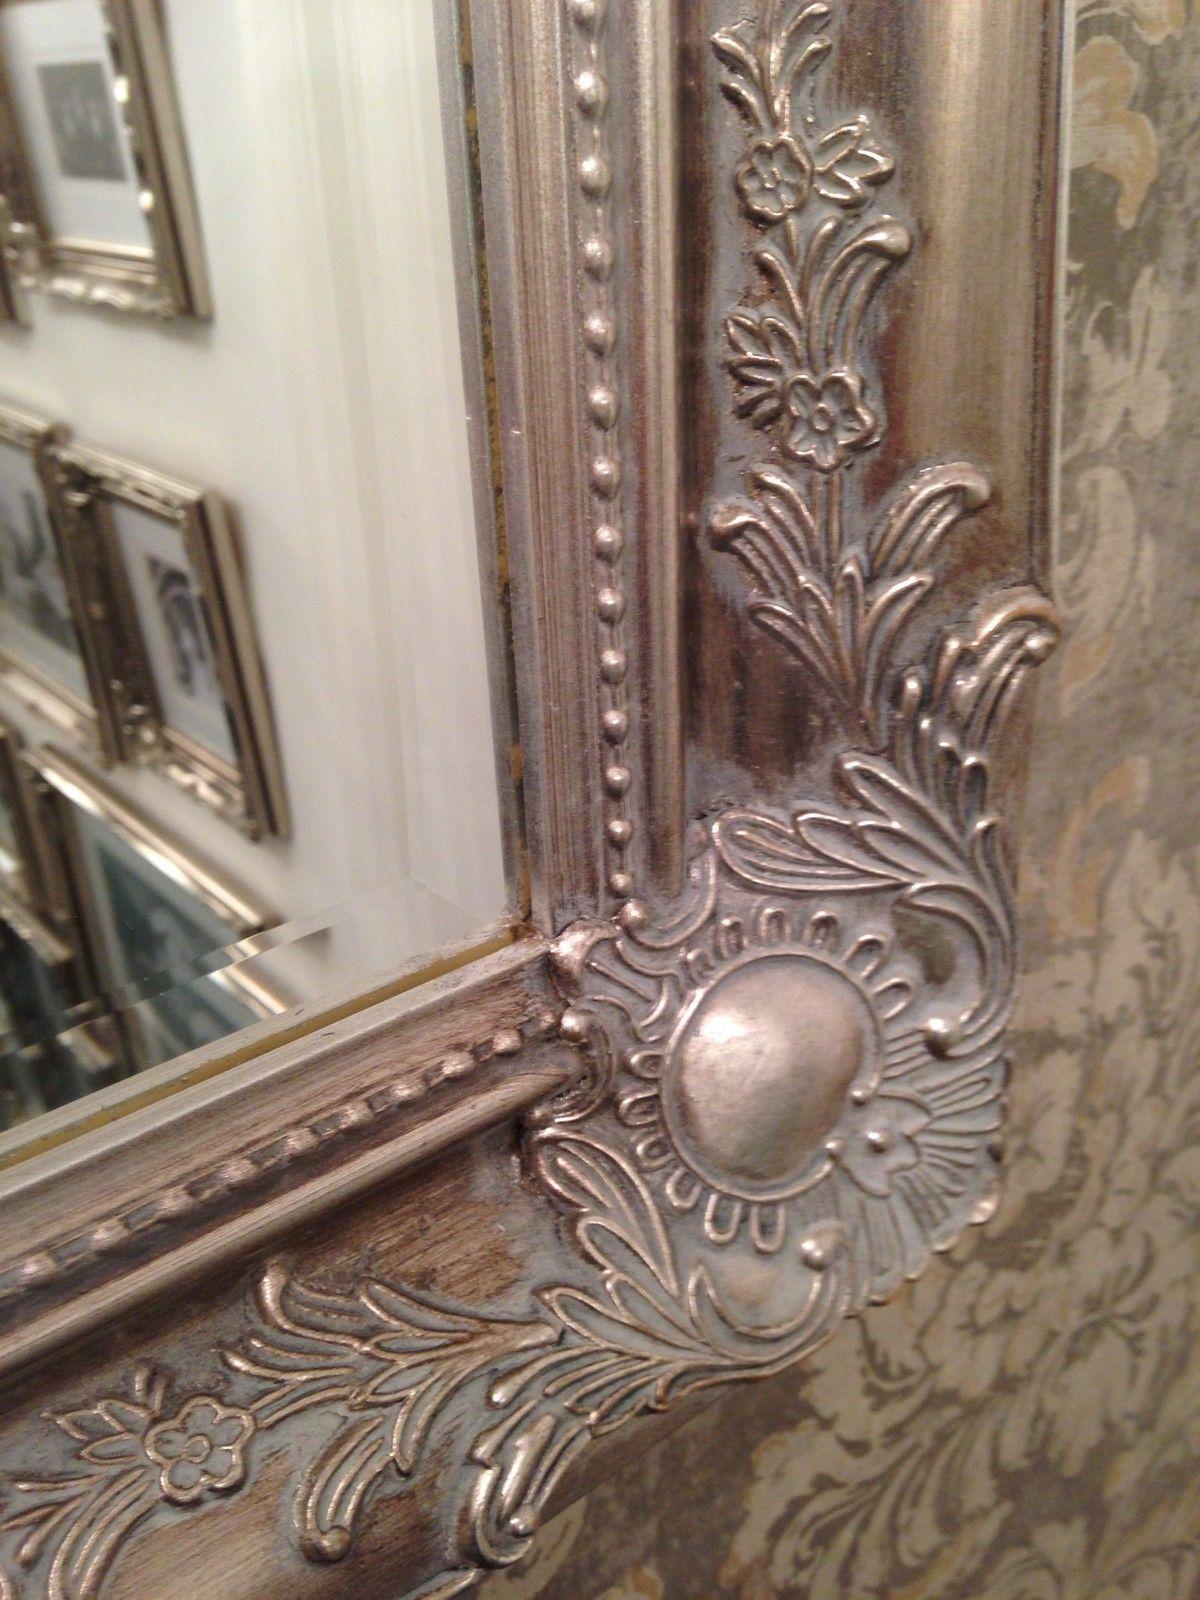 antique silver shabby chic ornate decorative over mantle wall mirror - Large Decorative Wall Mirrors